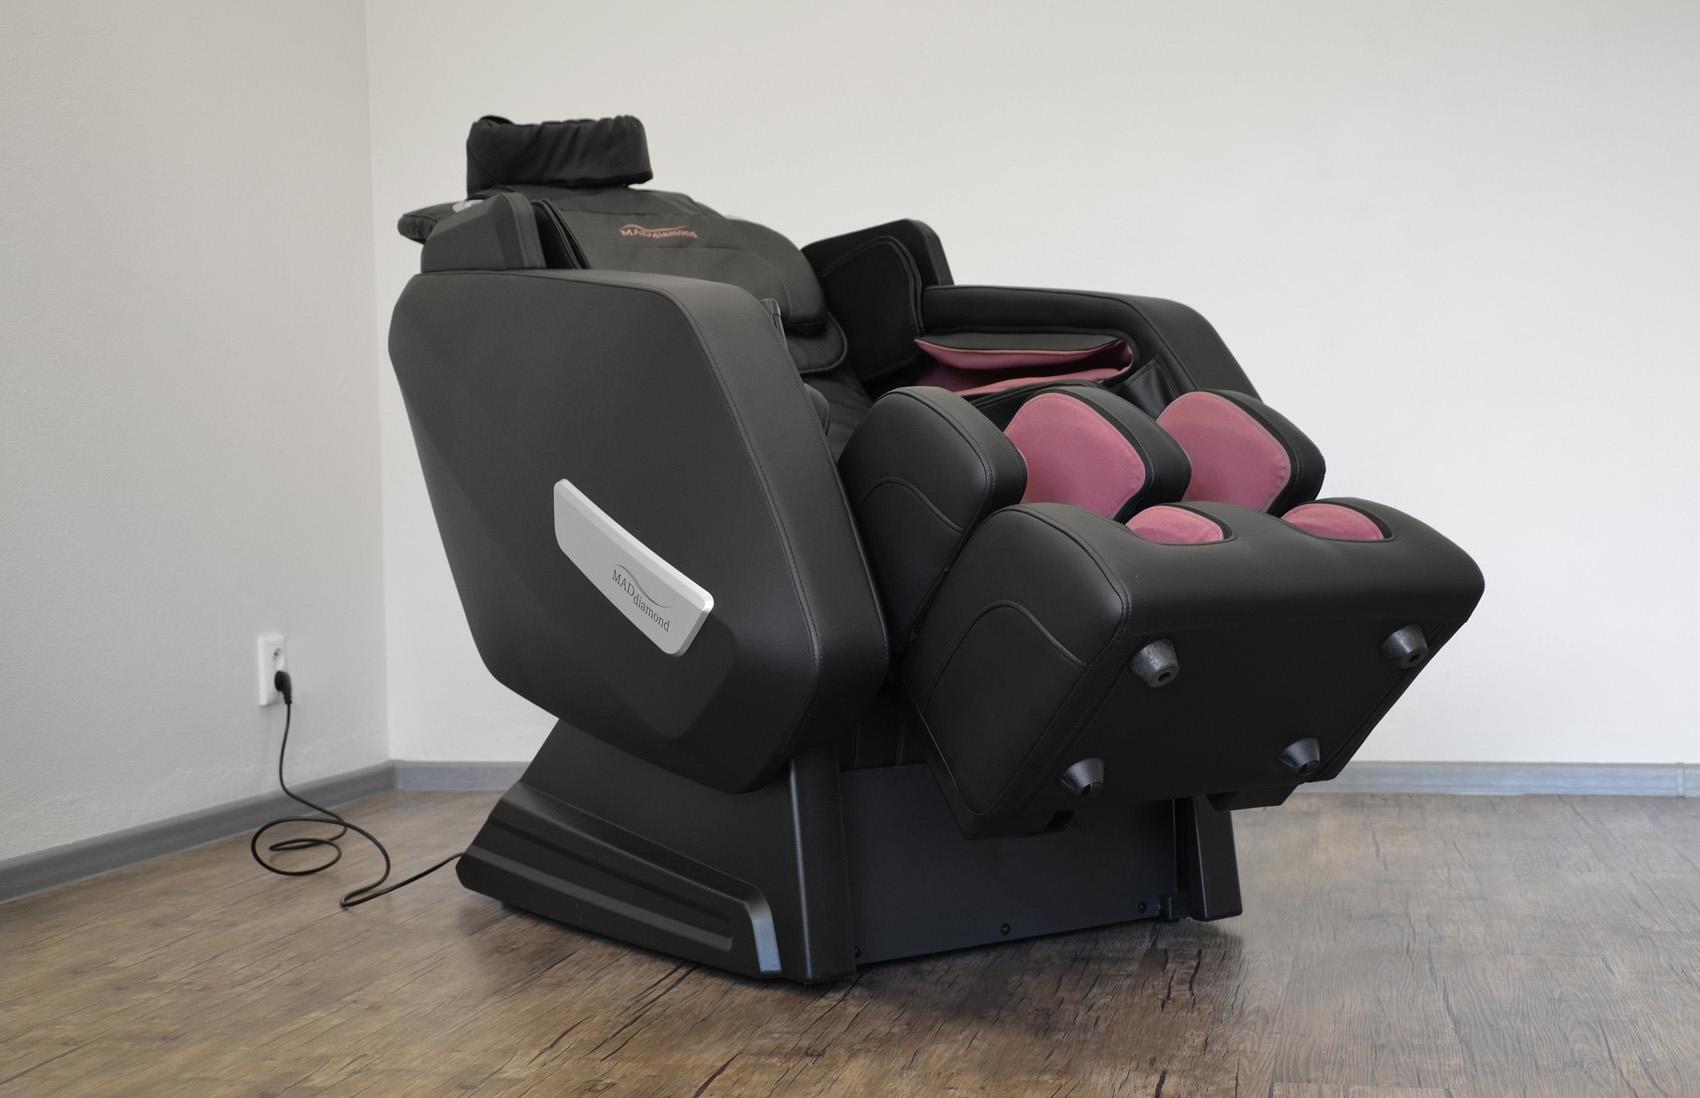 massage sessel md l9000 maddiamond. Black Bedroom Furniture Sets. Home Design Ideas